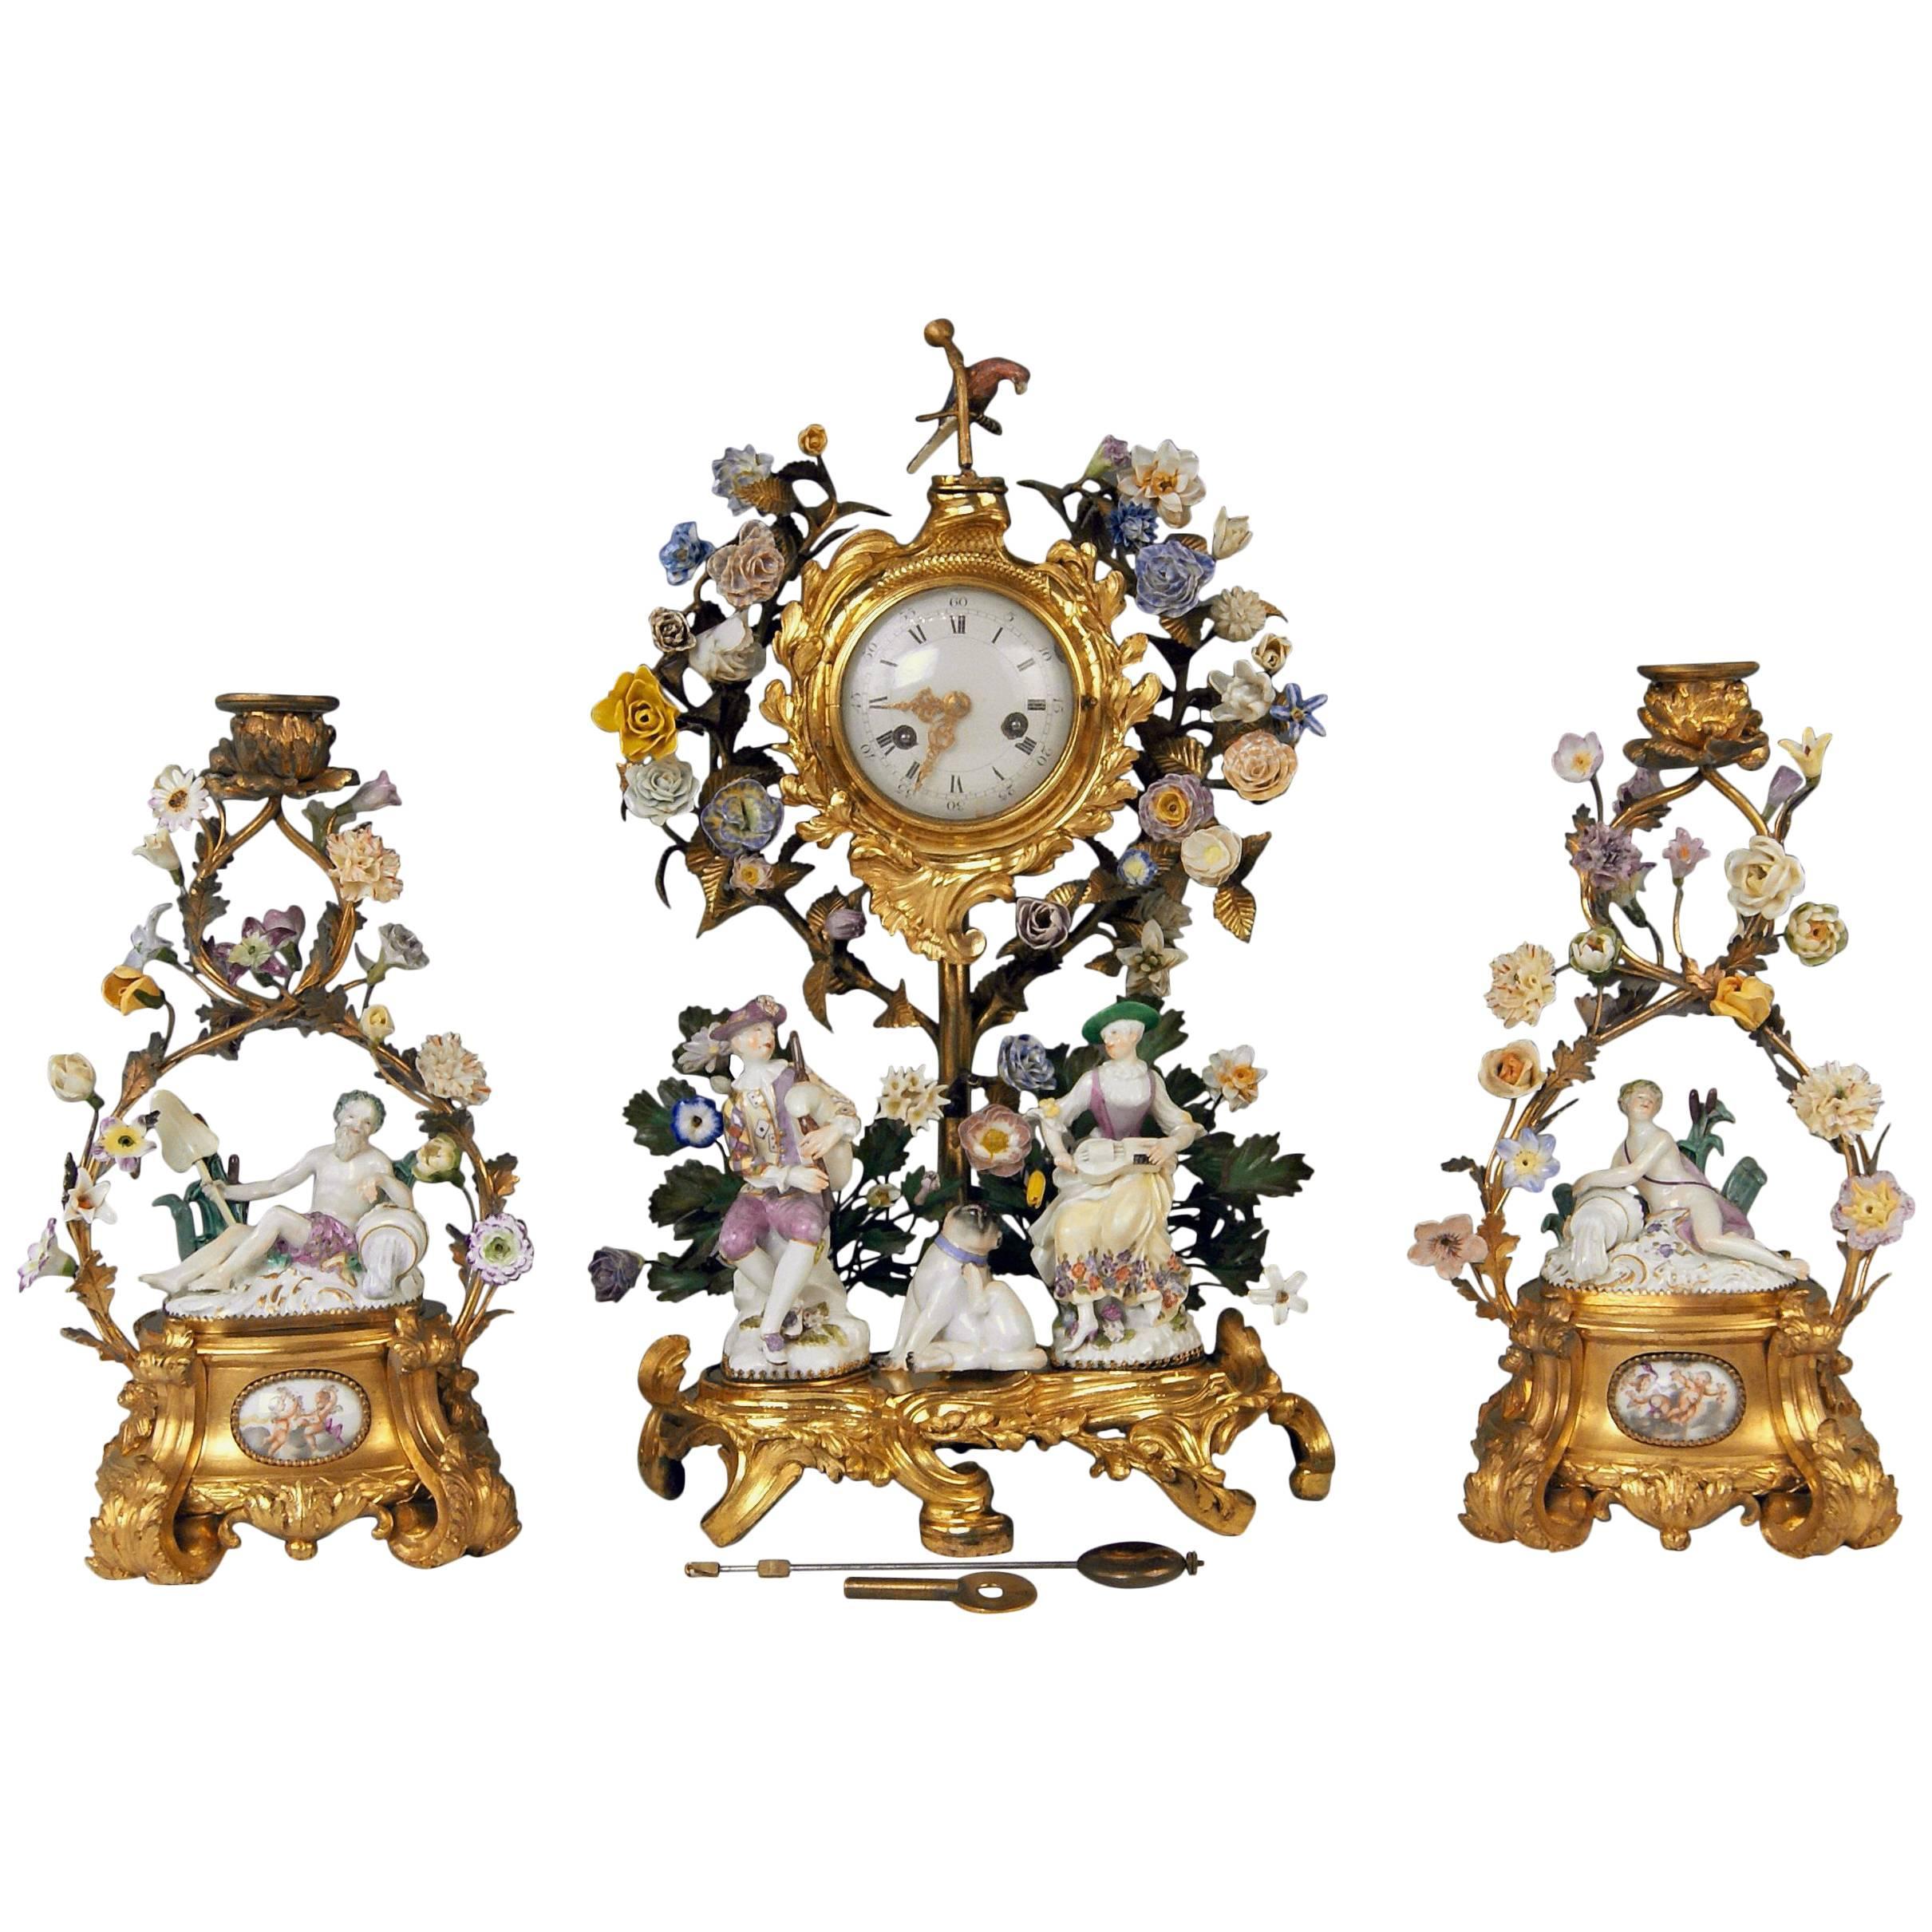 Meissen Ormolu Set Mantel Table Clock Two Candlesticks Porcelain Kaendler, 1770